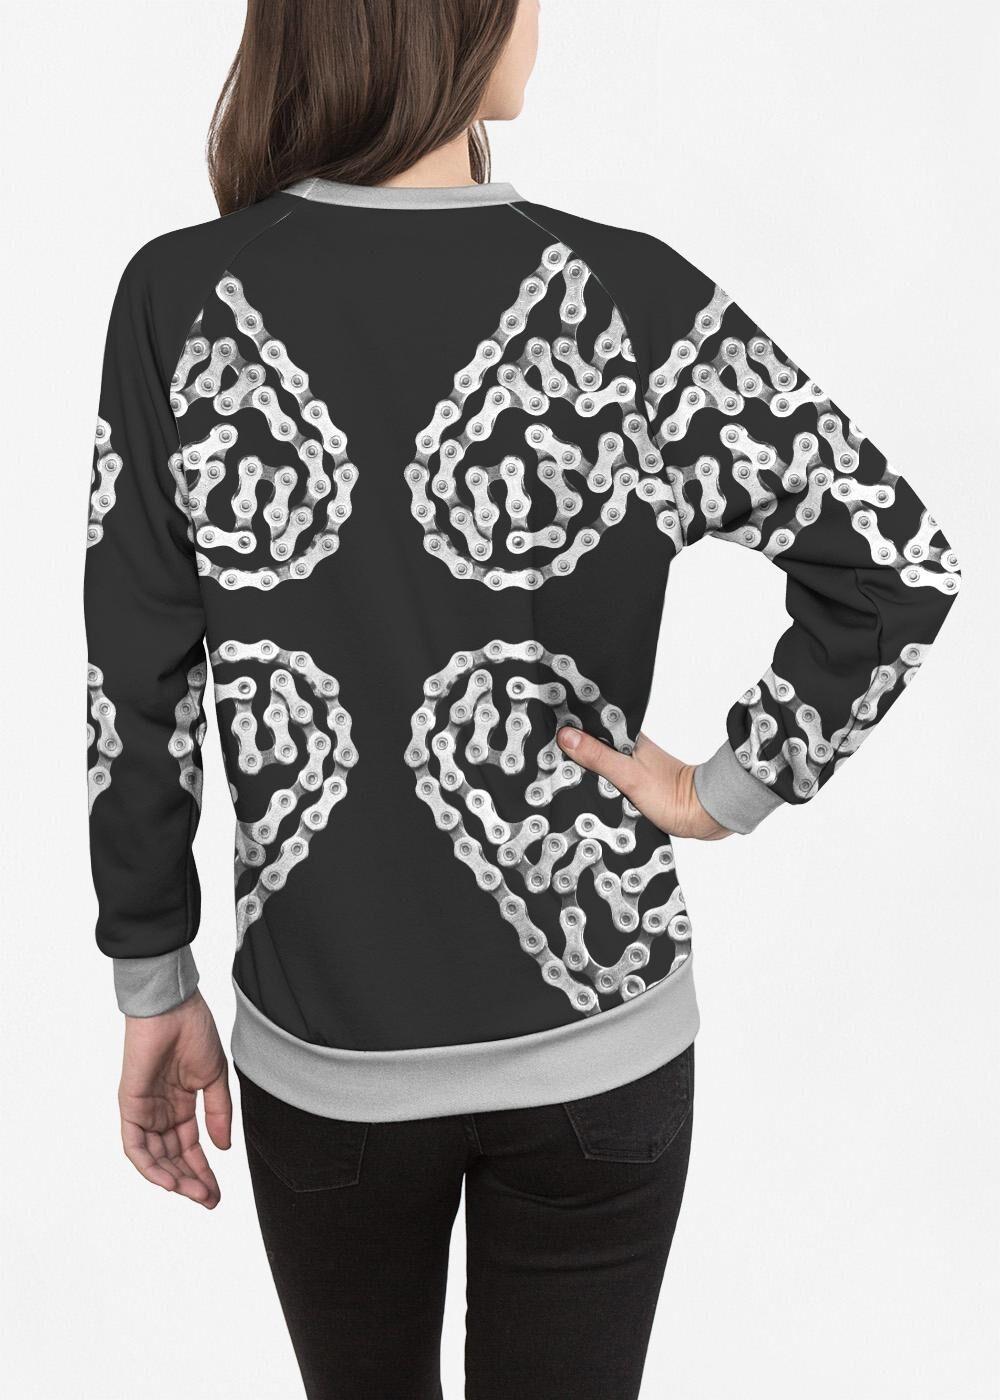 VIDA Women's Crewneck Sweatshirt - Bike Chain Heart by VIDA Original Artist  - Size: Small